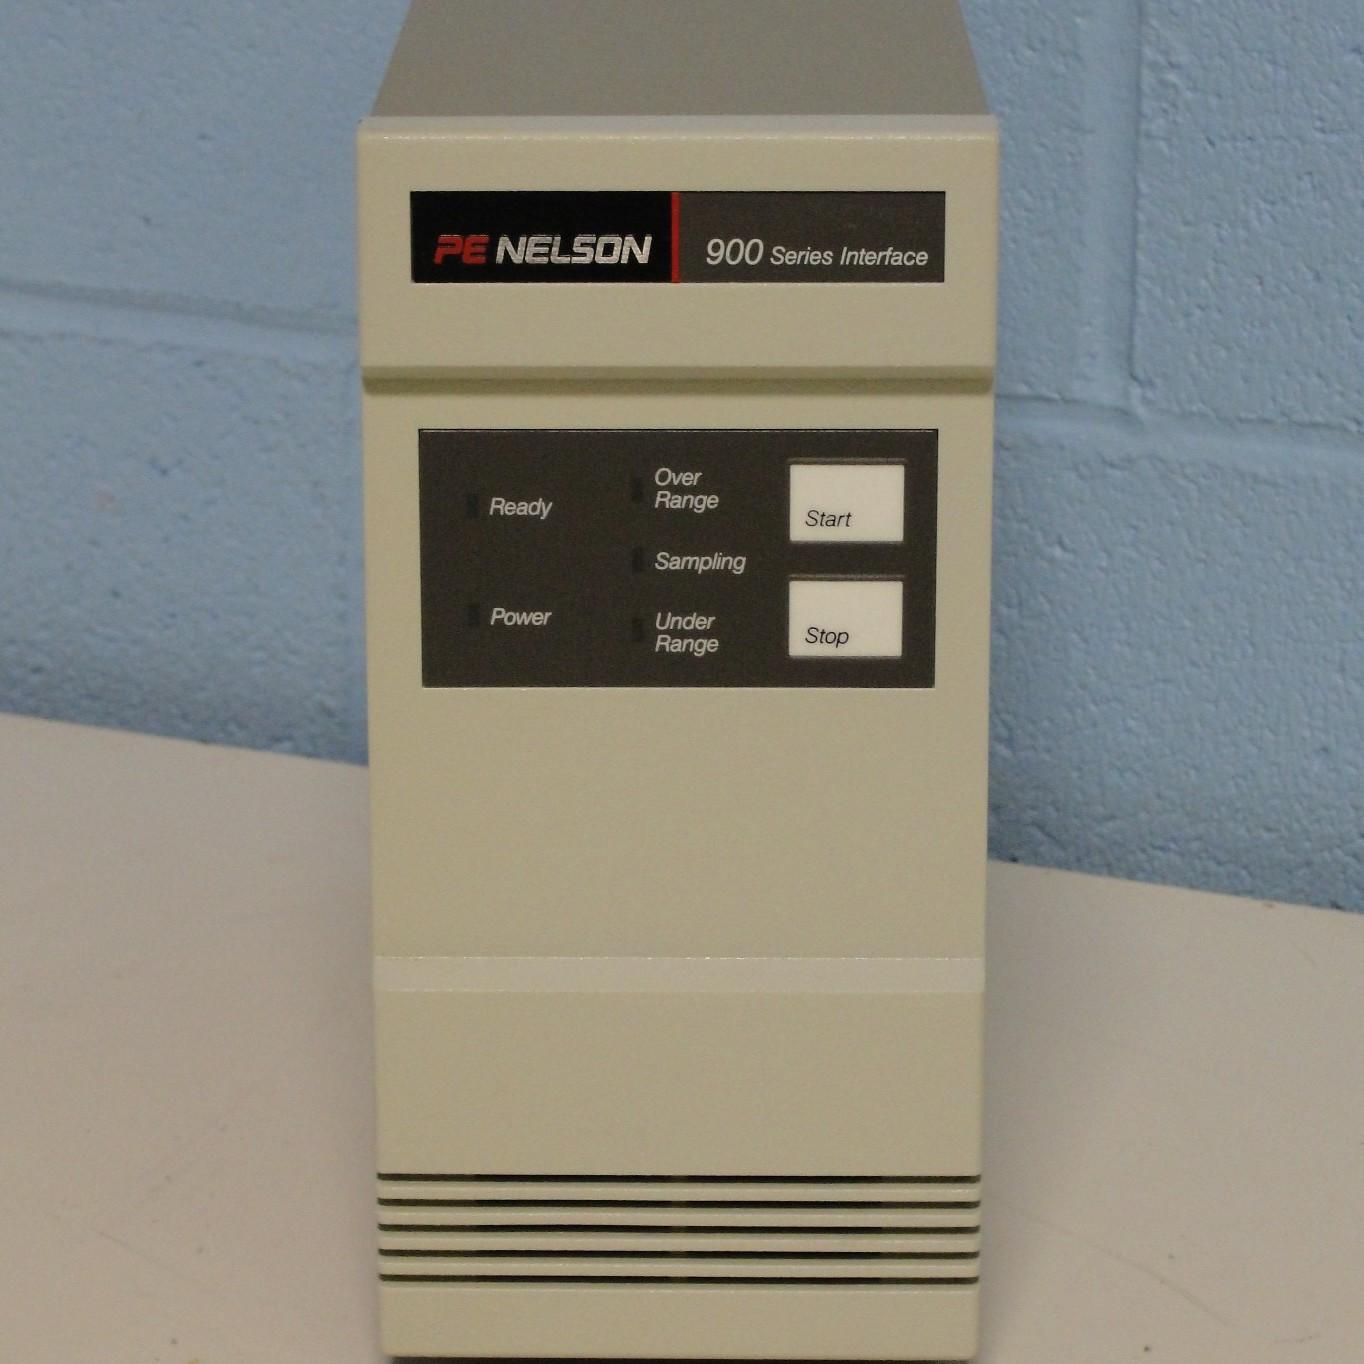 Perkin Elmer PE Nelson 900 Series Interface Model 970A Image